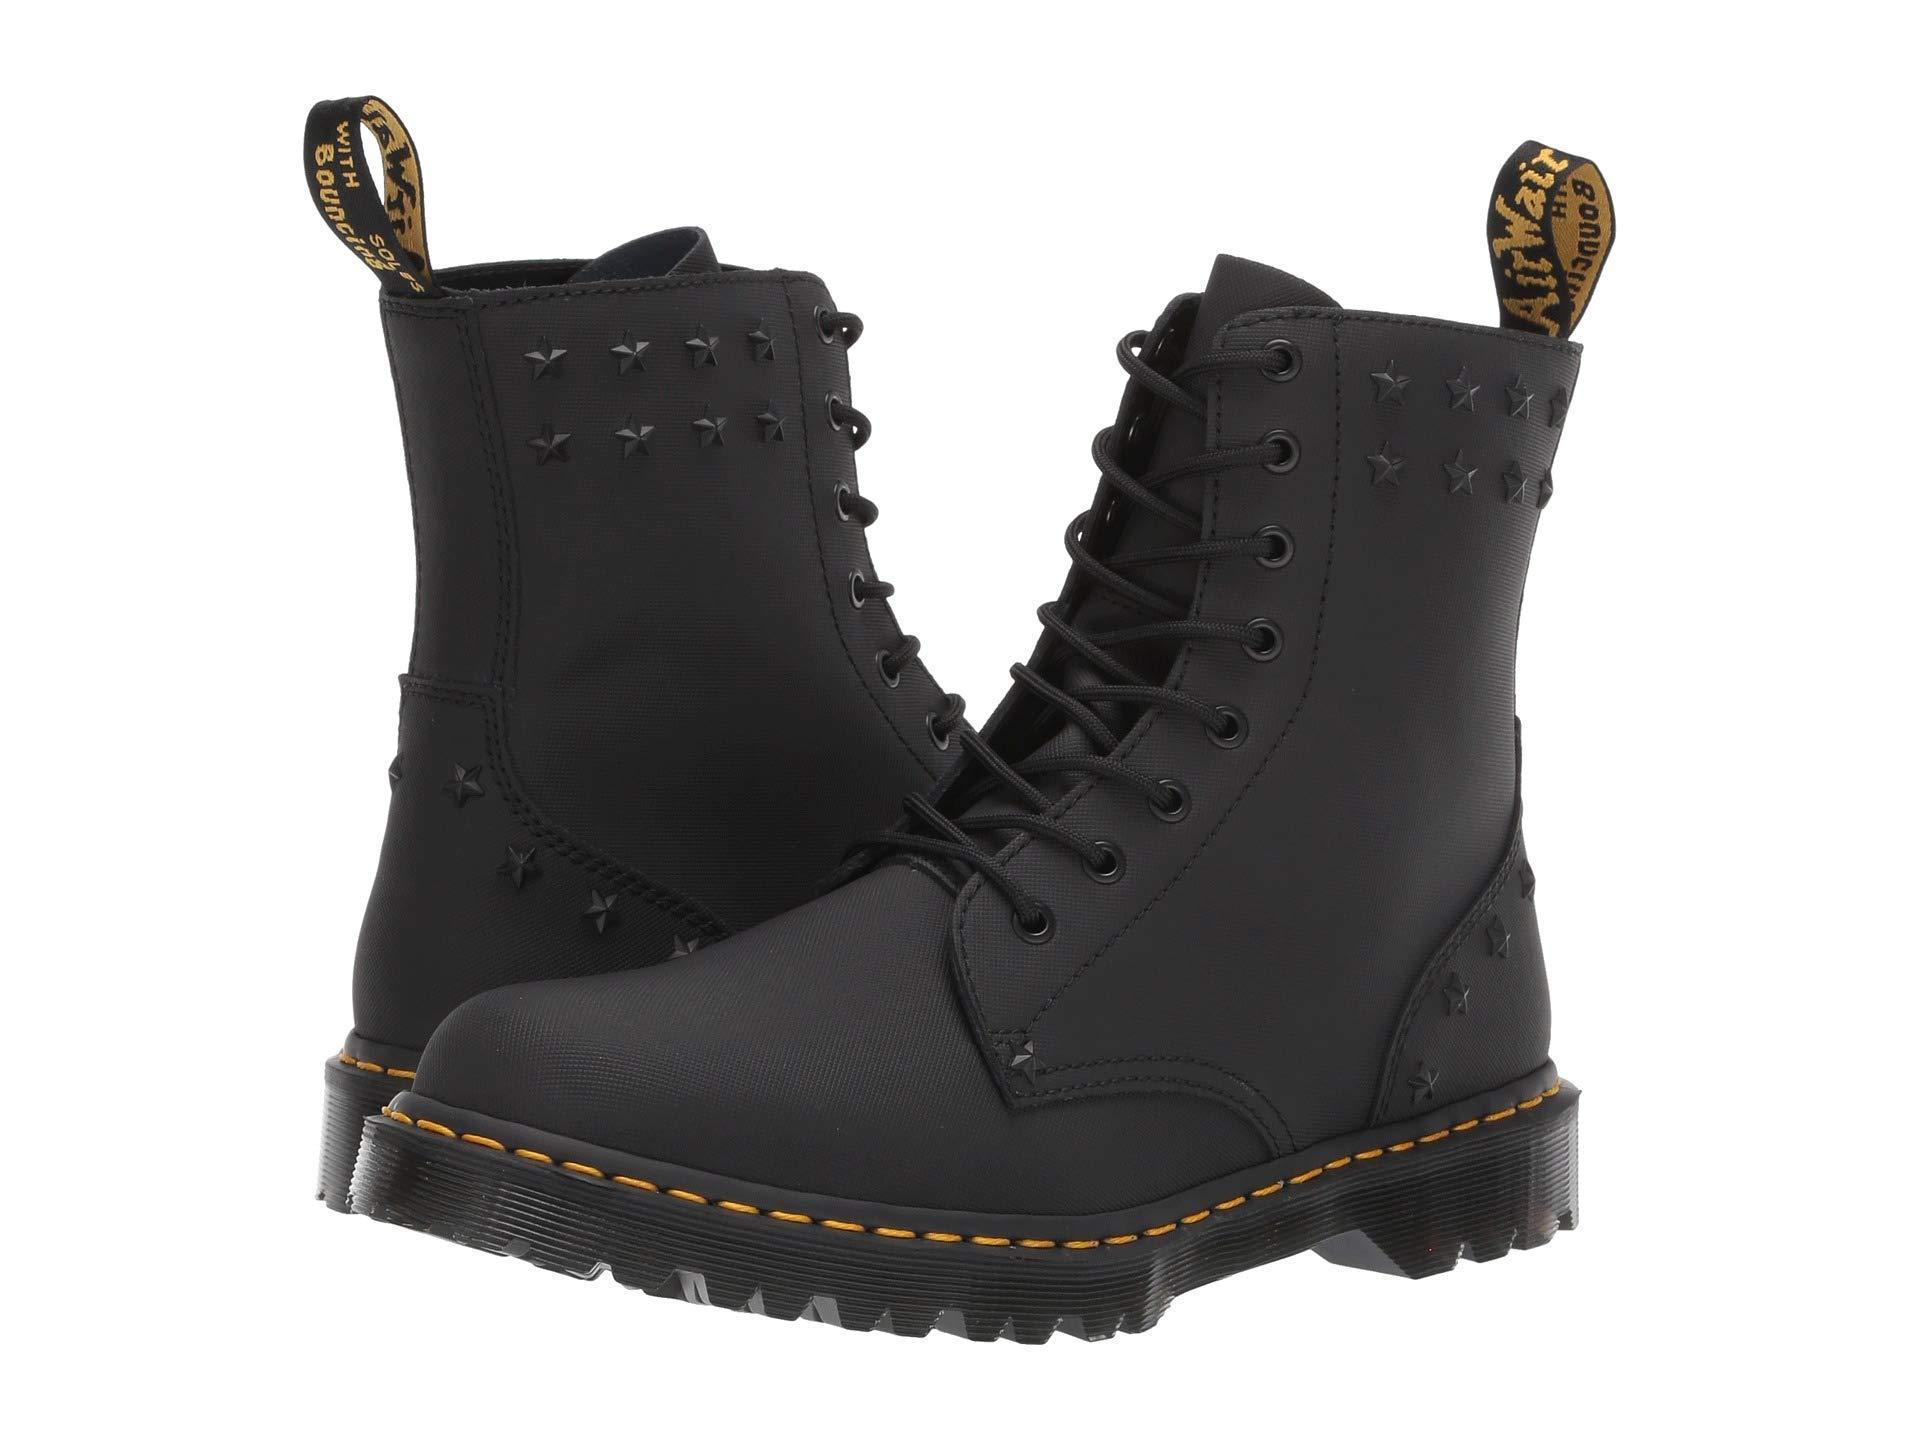 5d223a8025a Lyst - Dr. Martens 1460 Ben (black) Boots in Black